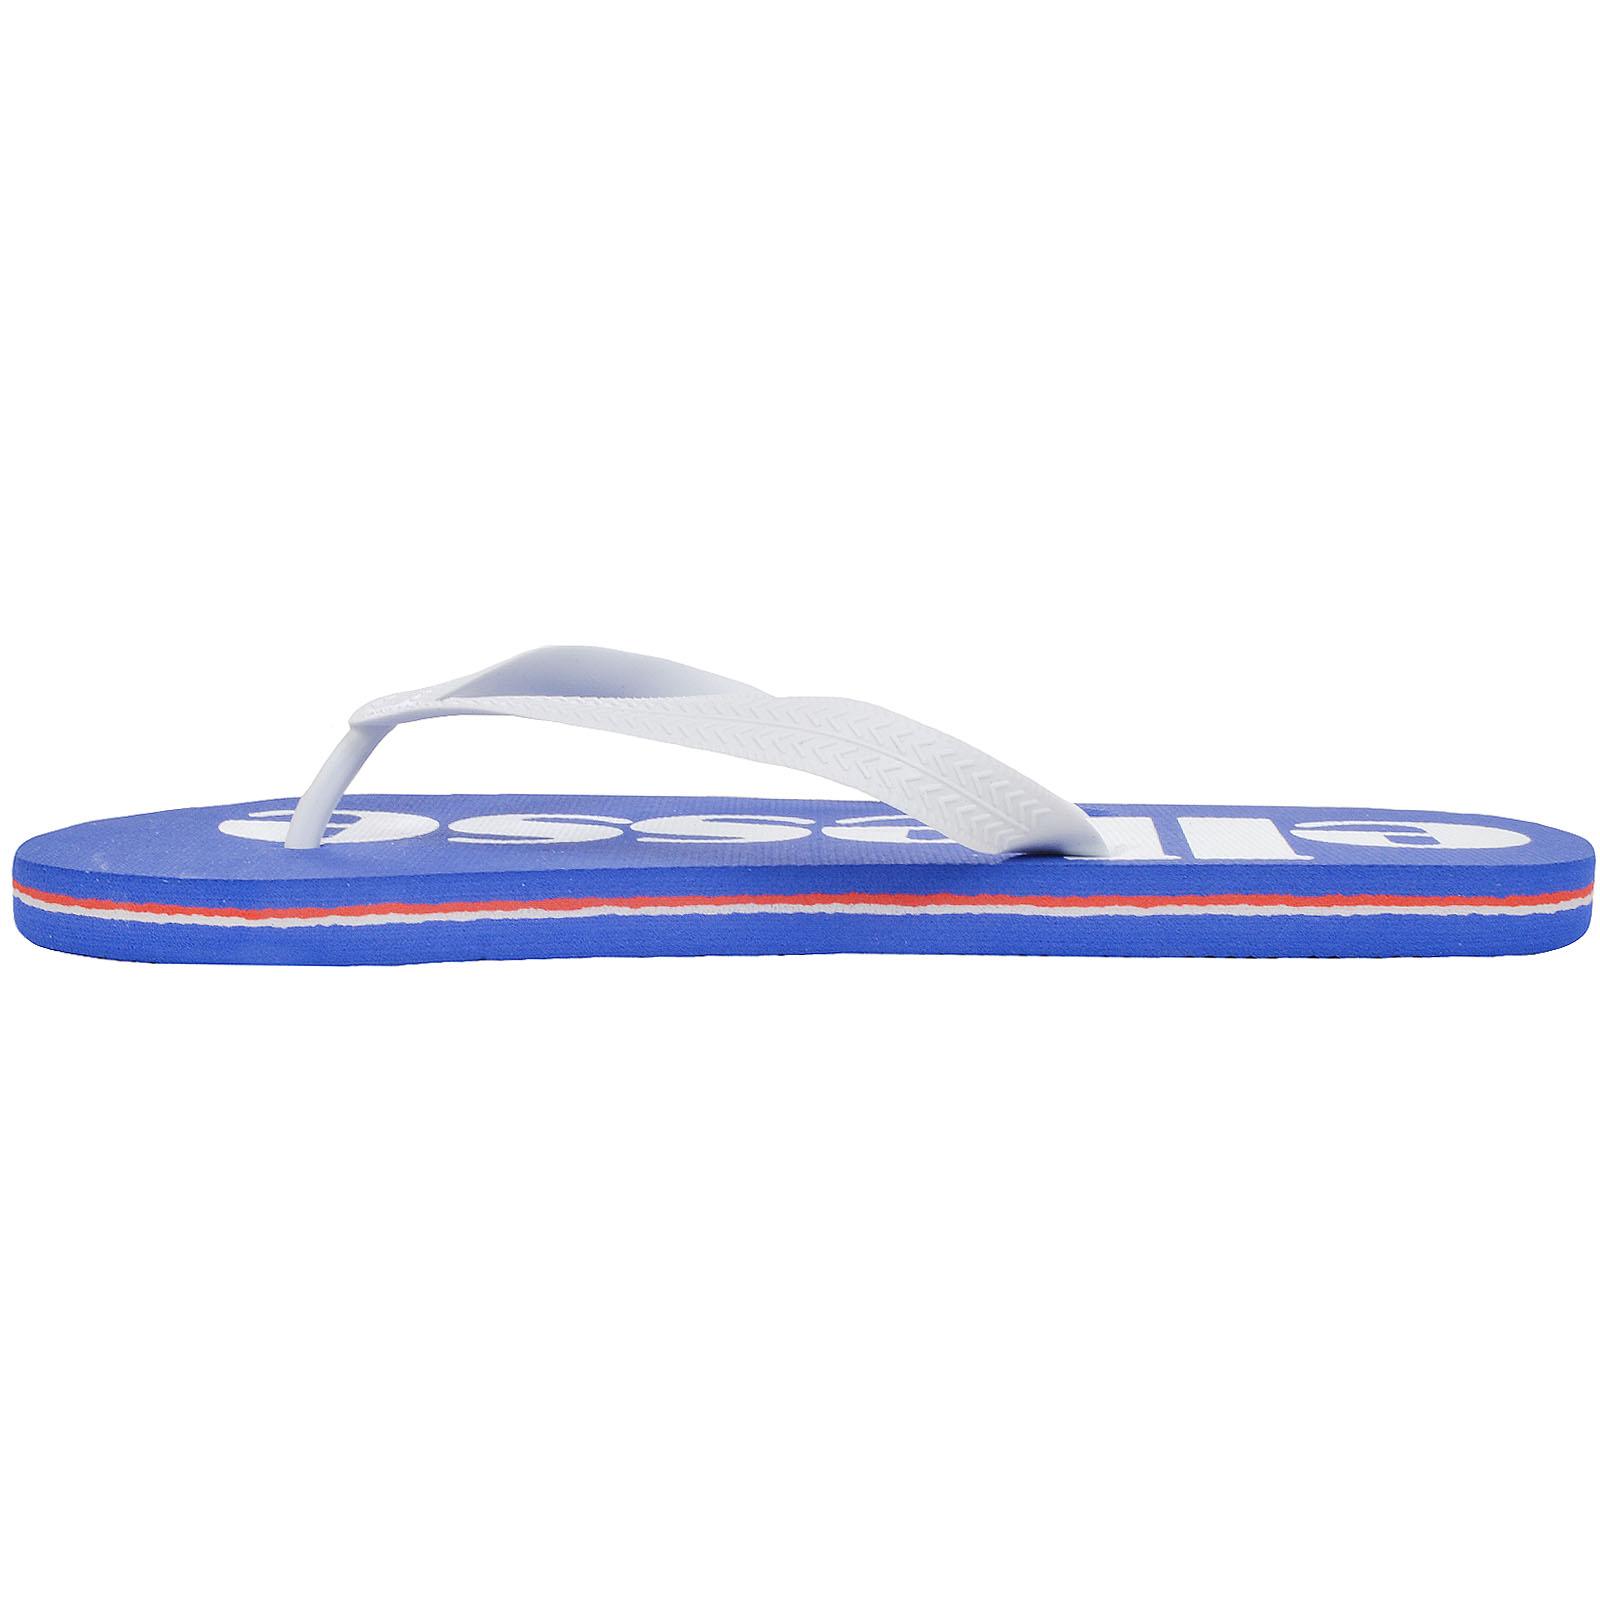 Ellesse-Mens-Marcos-Flip-Flops-Beach-Pool-Holiday-Slip-On-Sandals-Thongs thumbnail 8